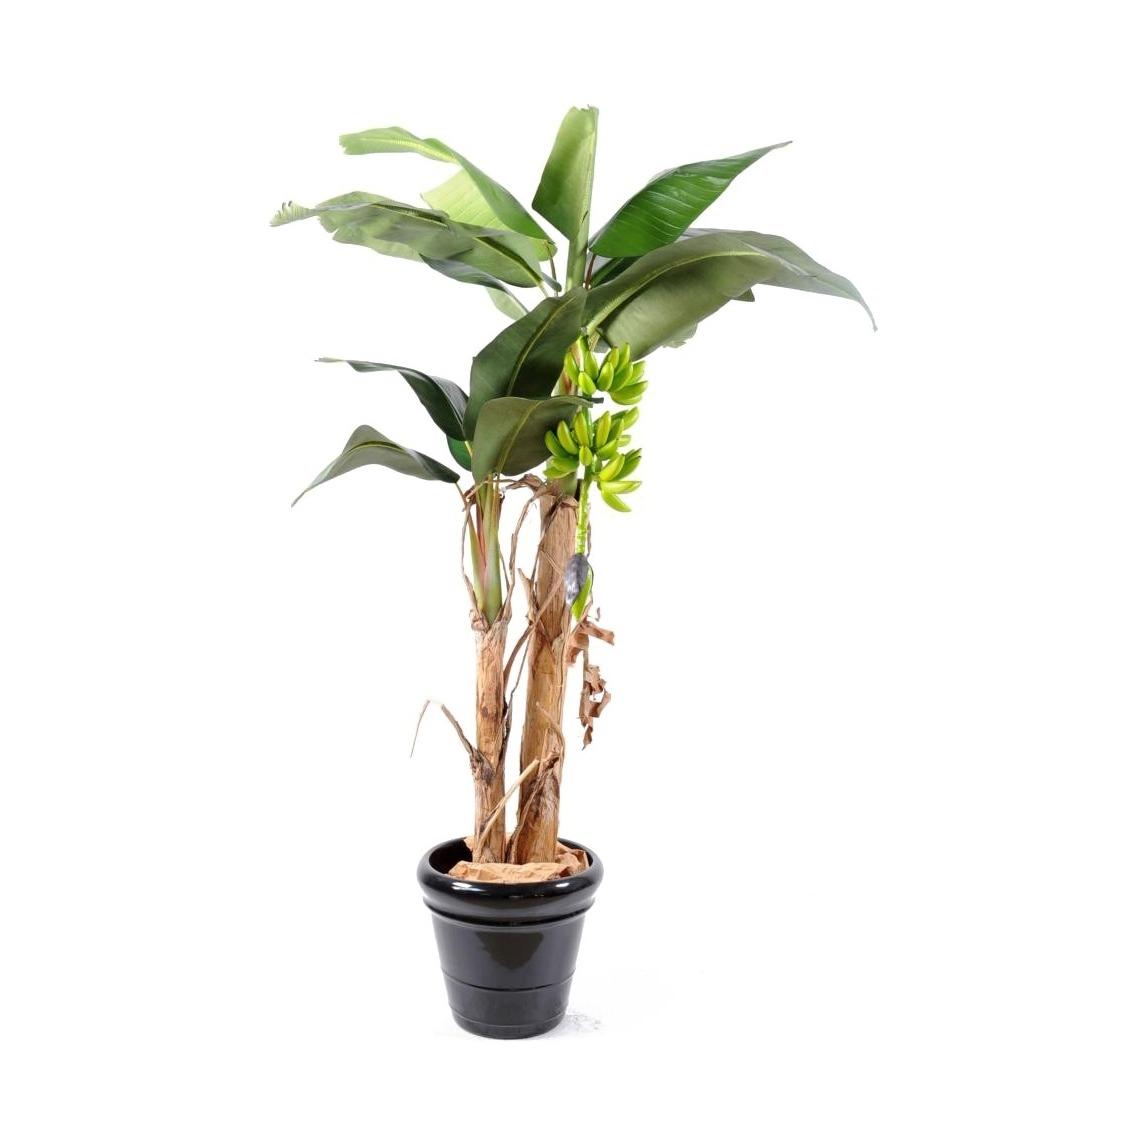 Bananier double tronc